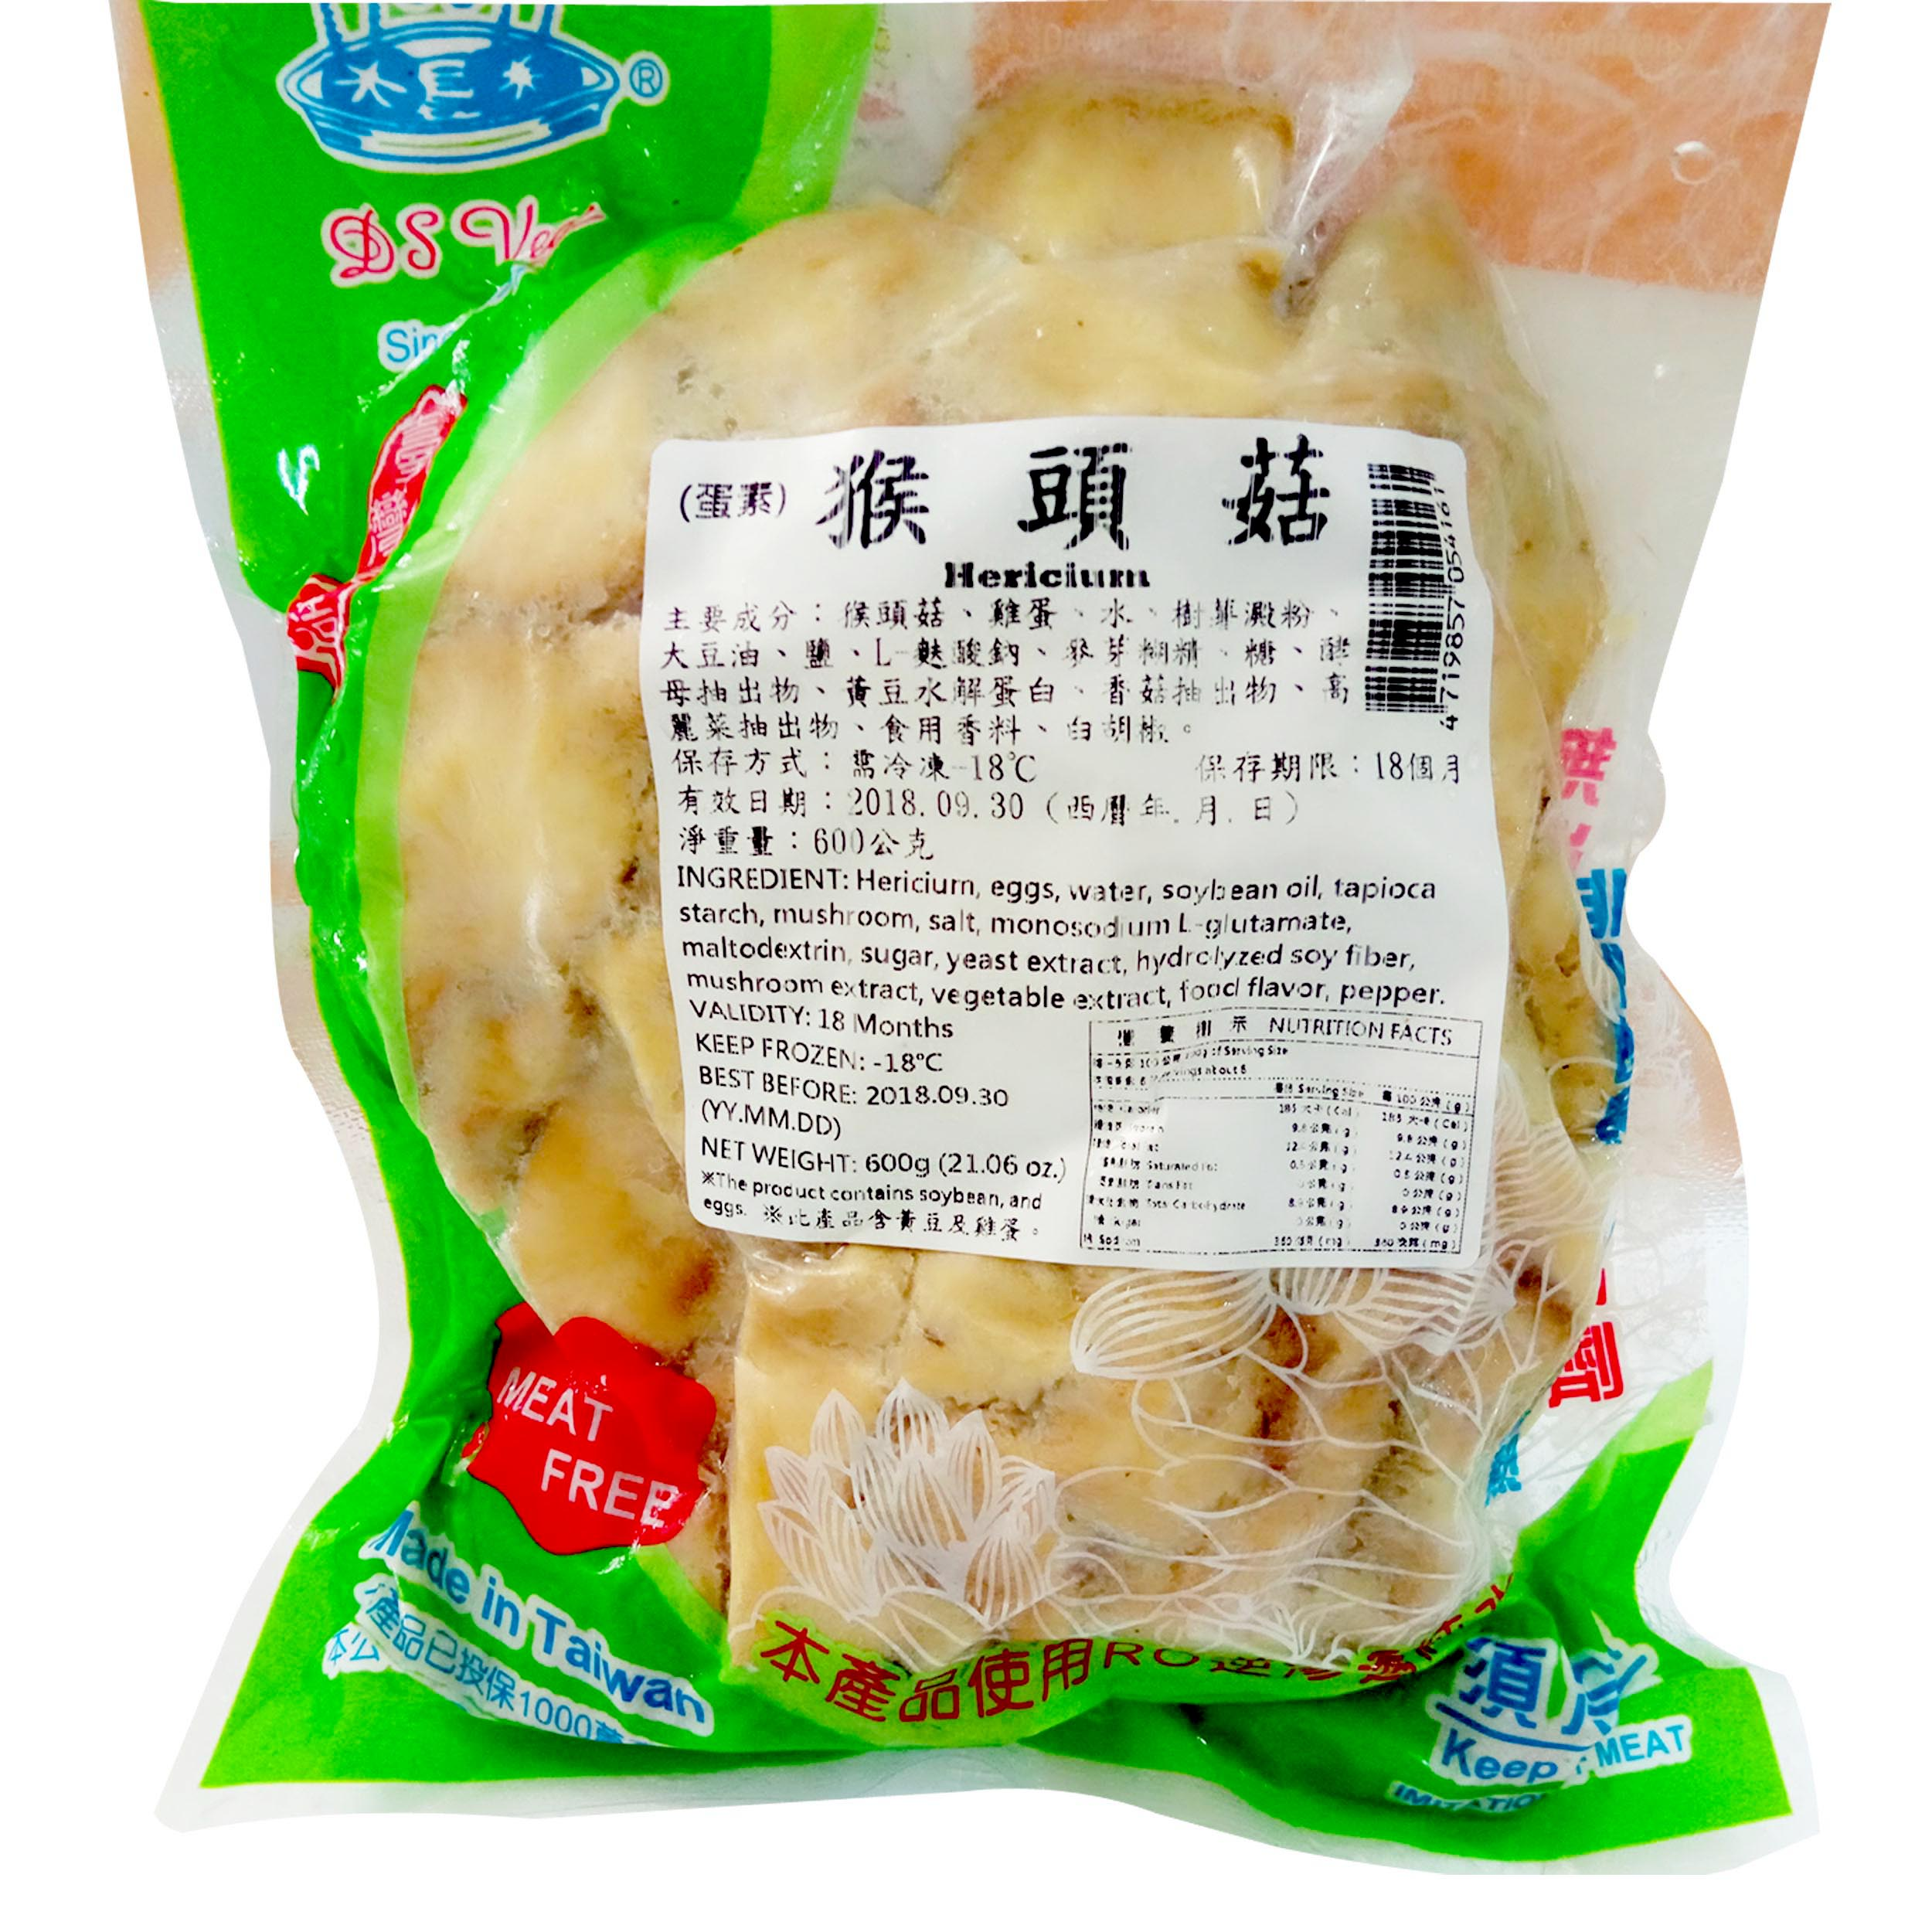 Image Monkeyhead Mushroom 大顺 - 猴头菇 600grams